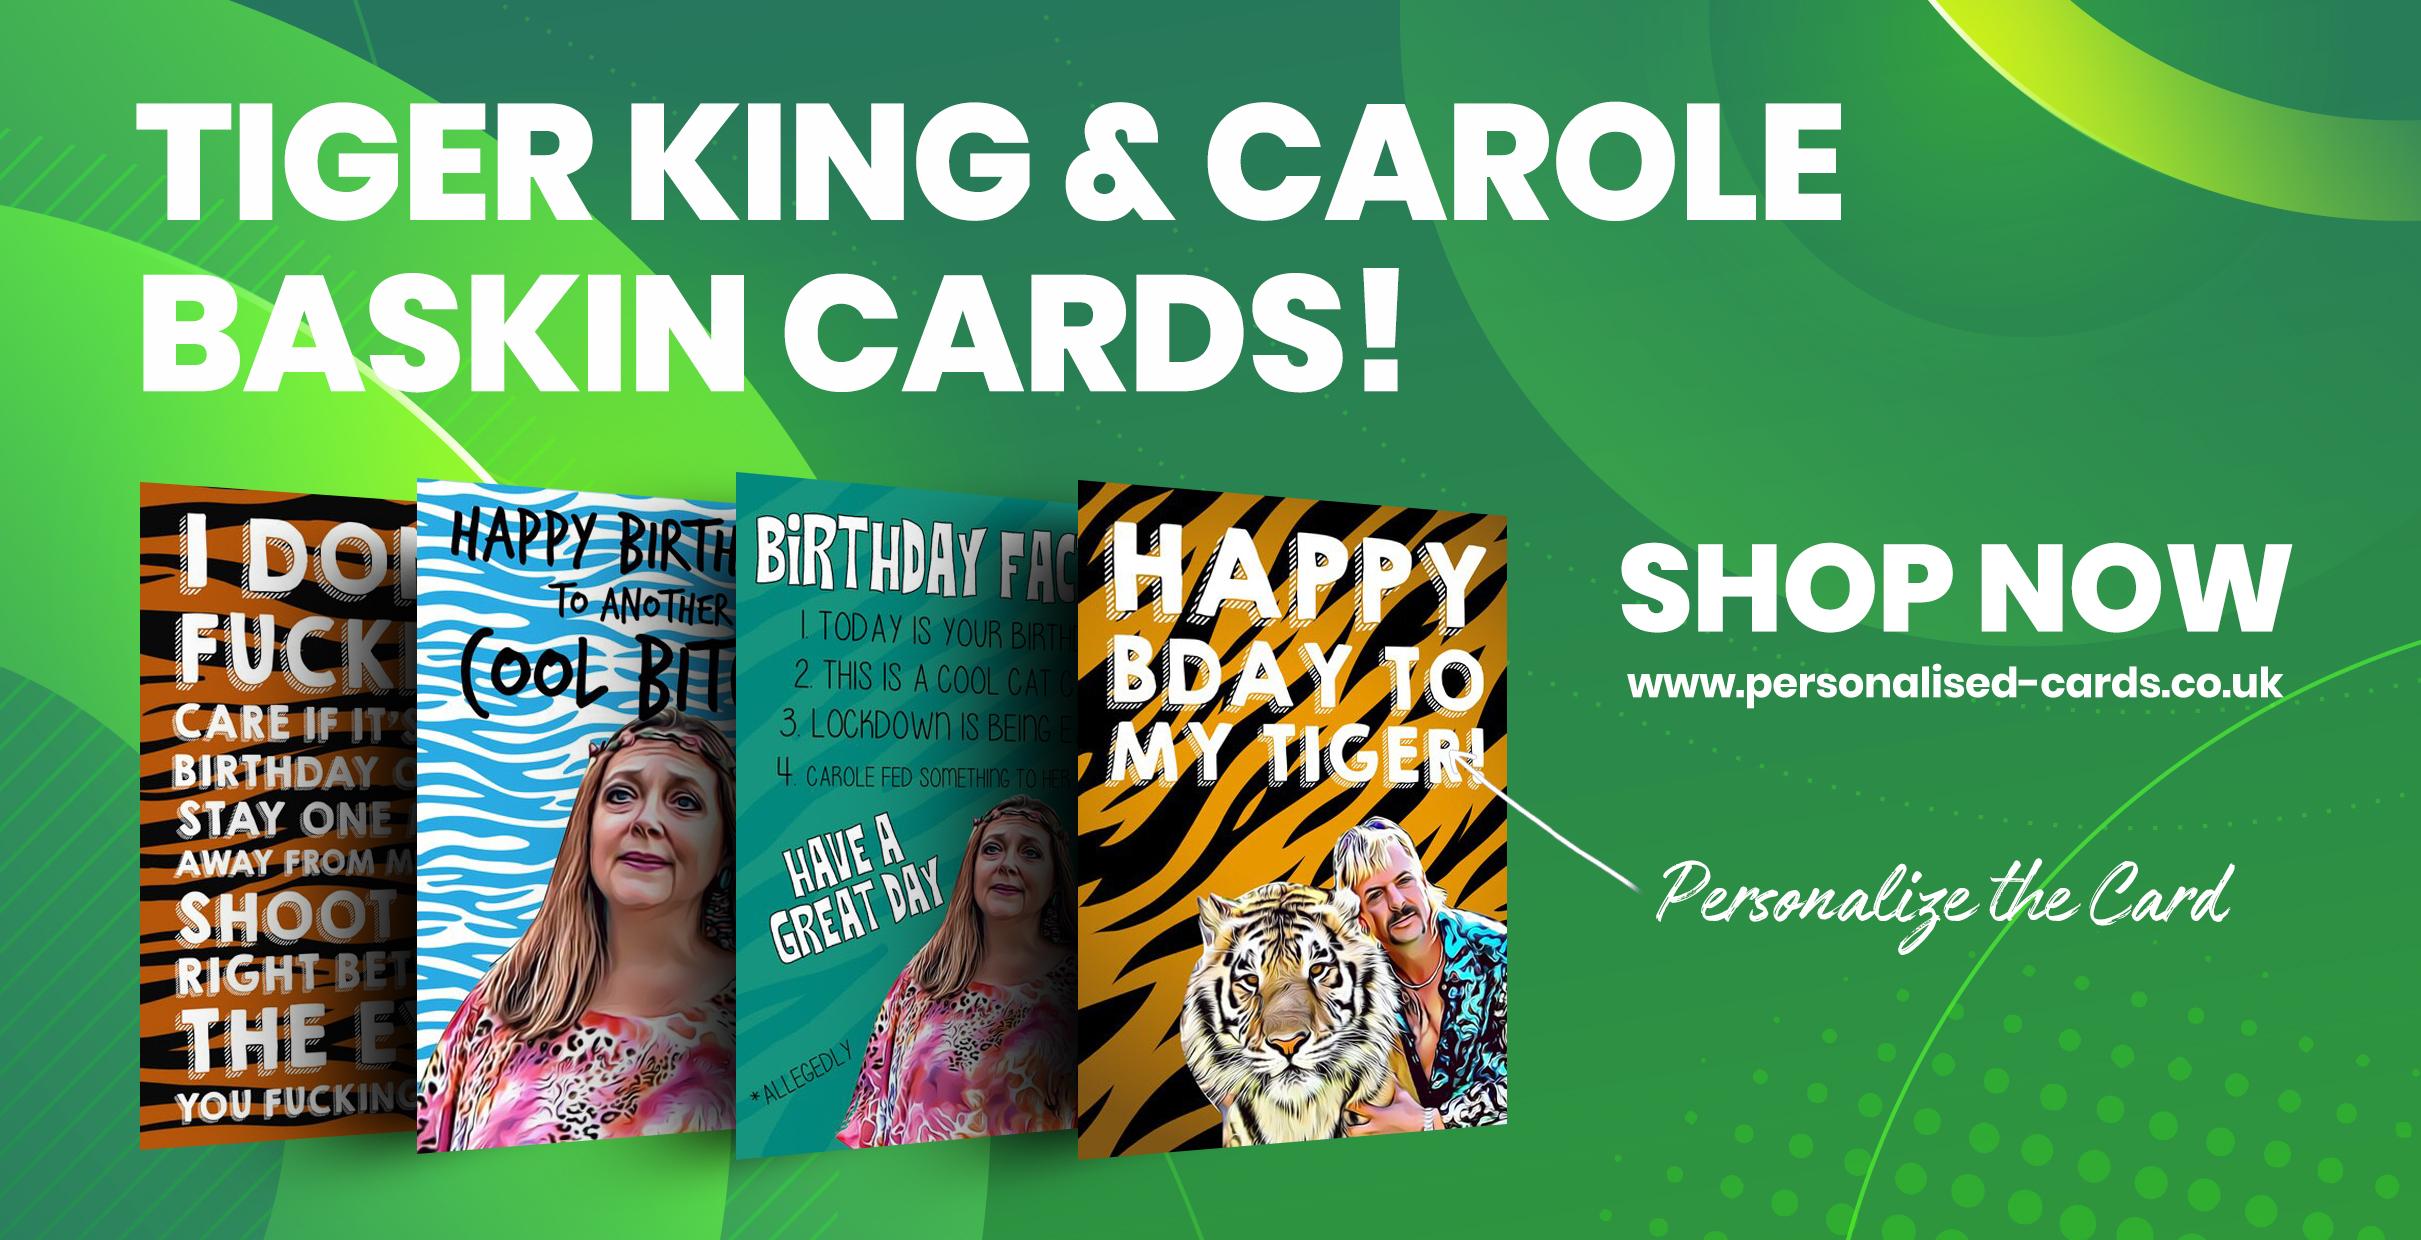 tiger-king-carole-baskin-cards.jpg